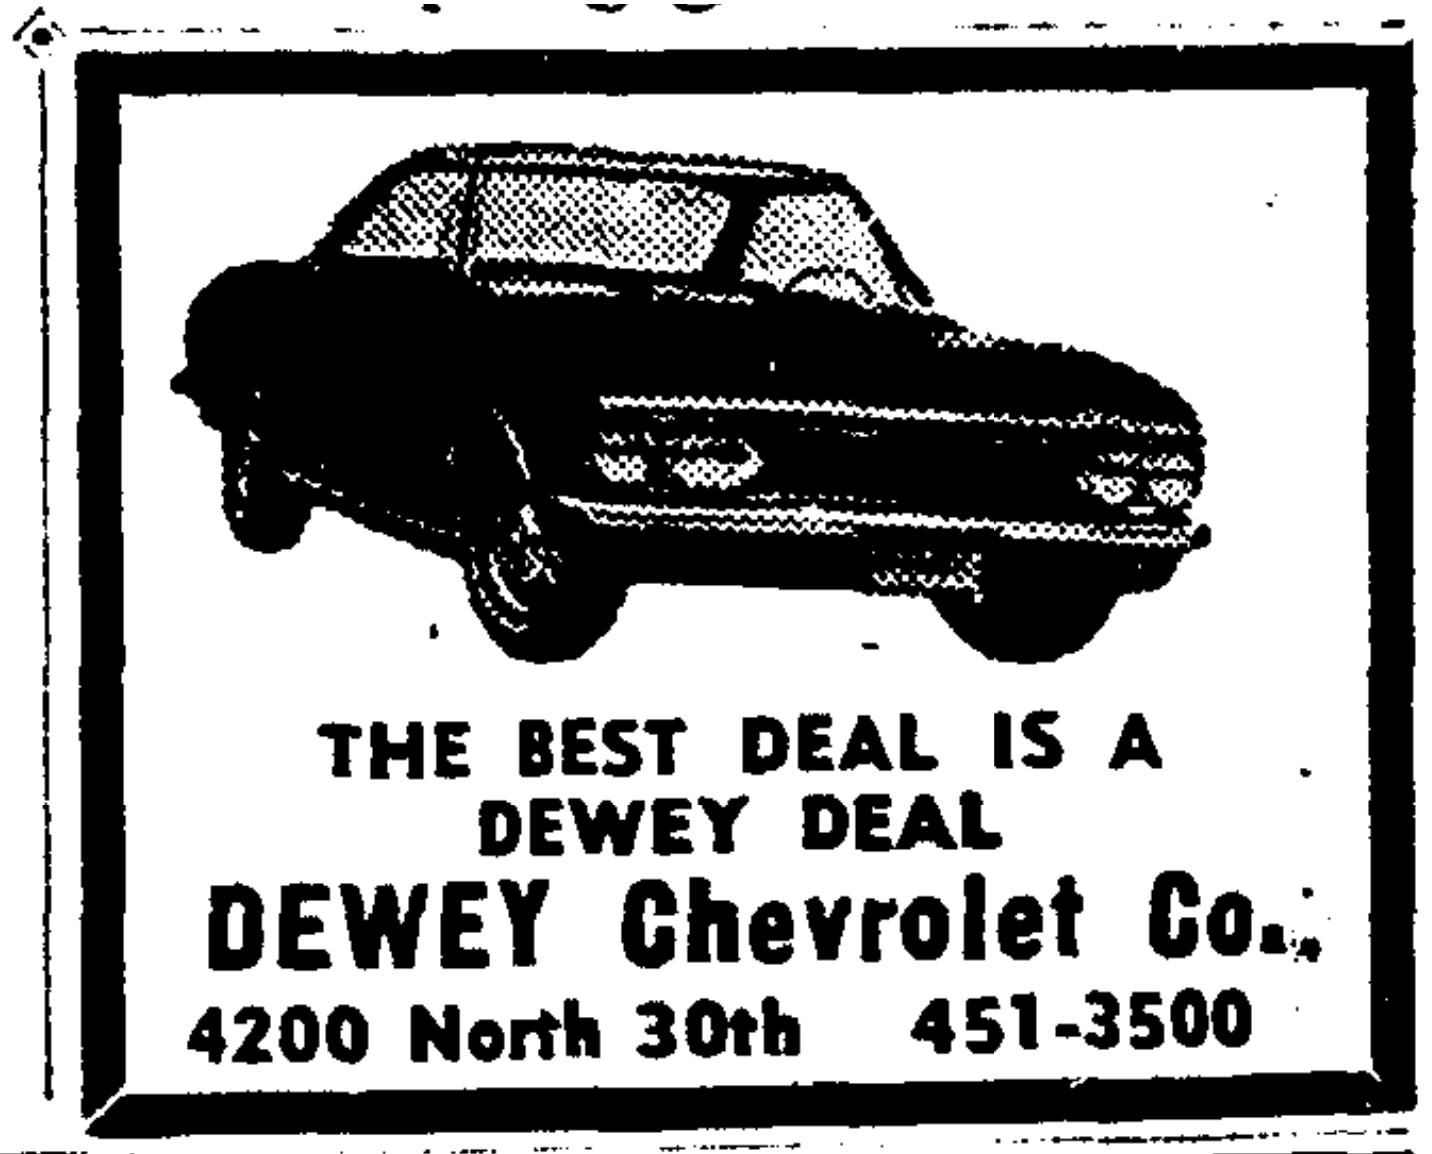 Dewey Chevy, 4200 N. 30th St., North Omaha, Nebraska